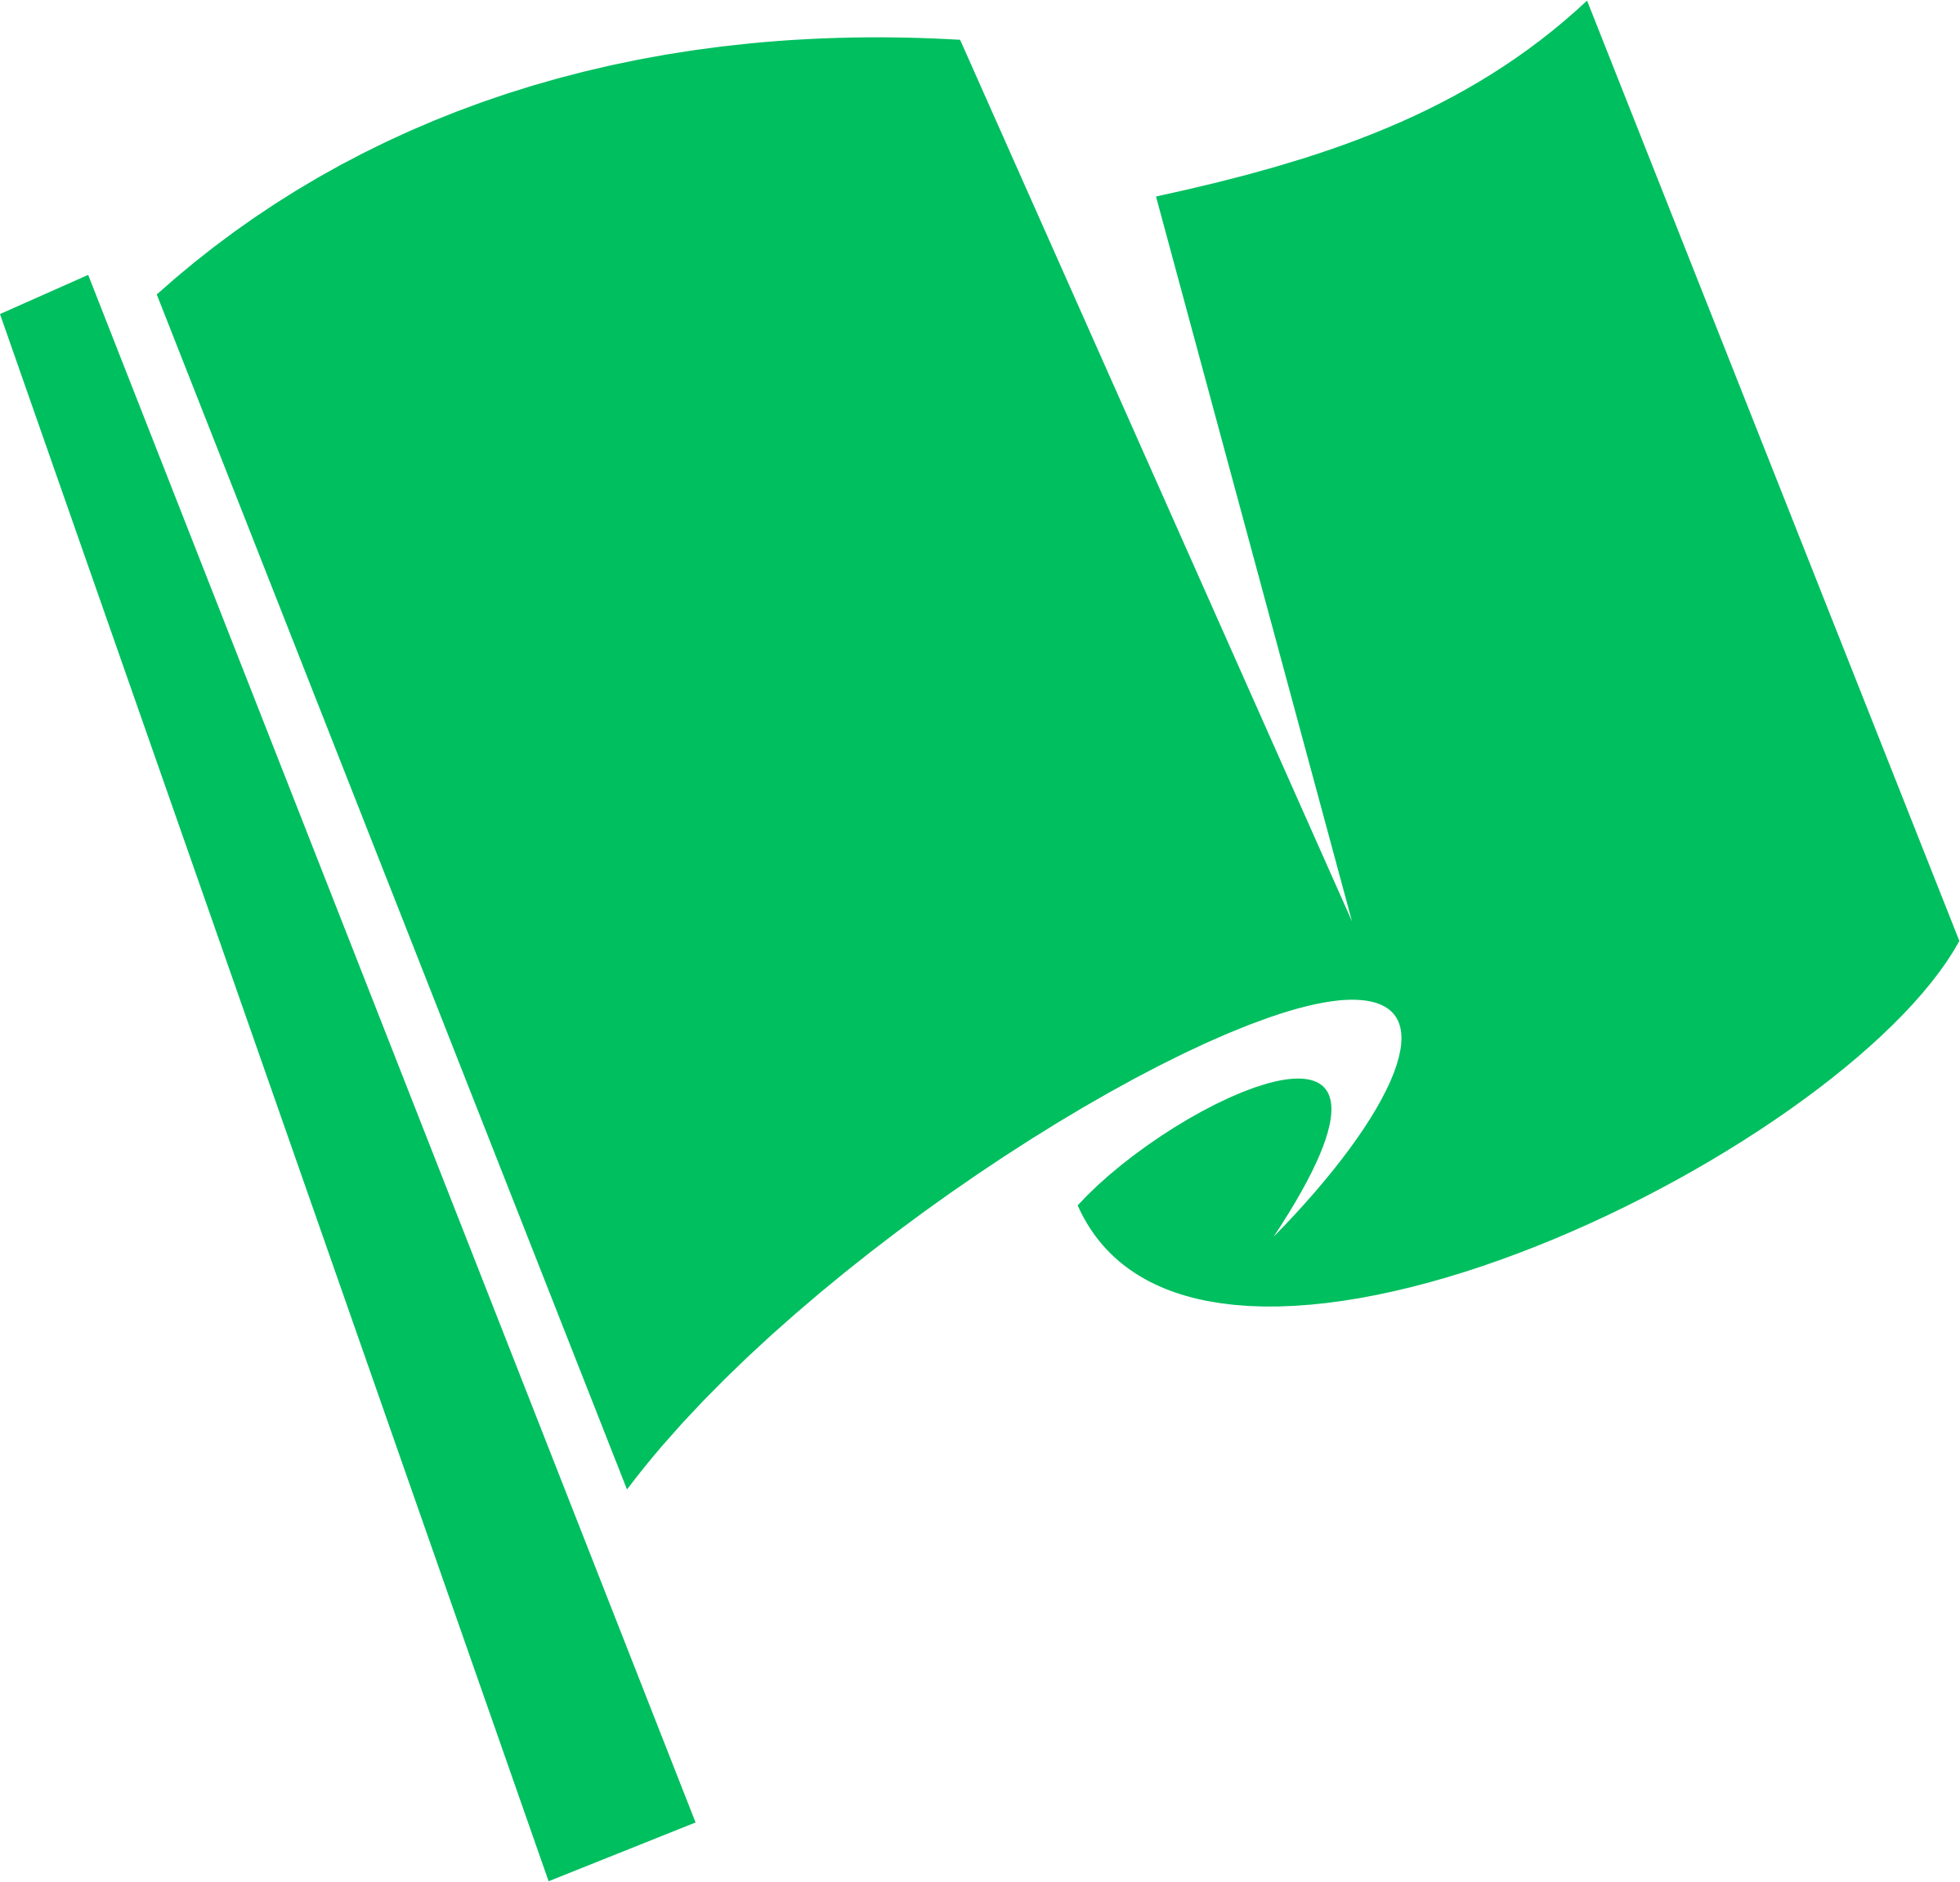 Big image png. Flag clipart green